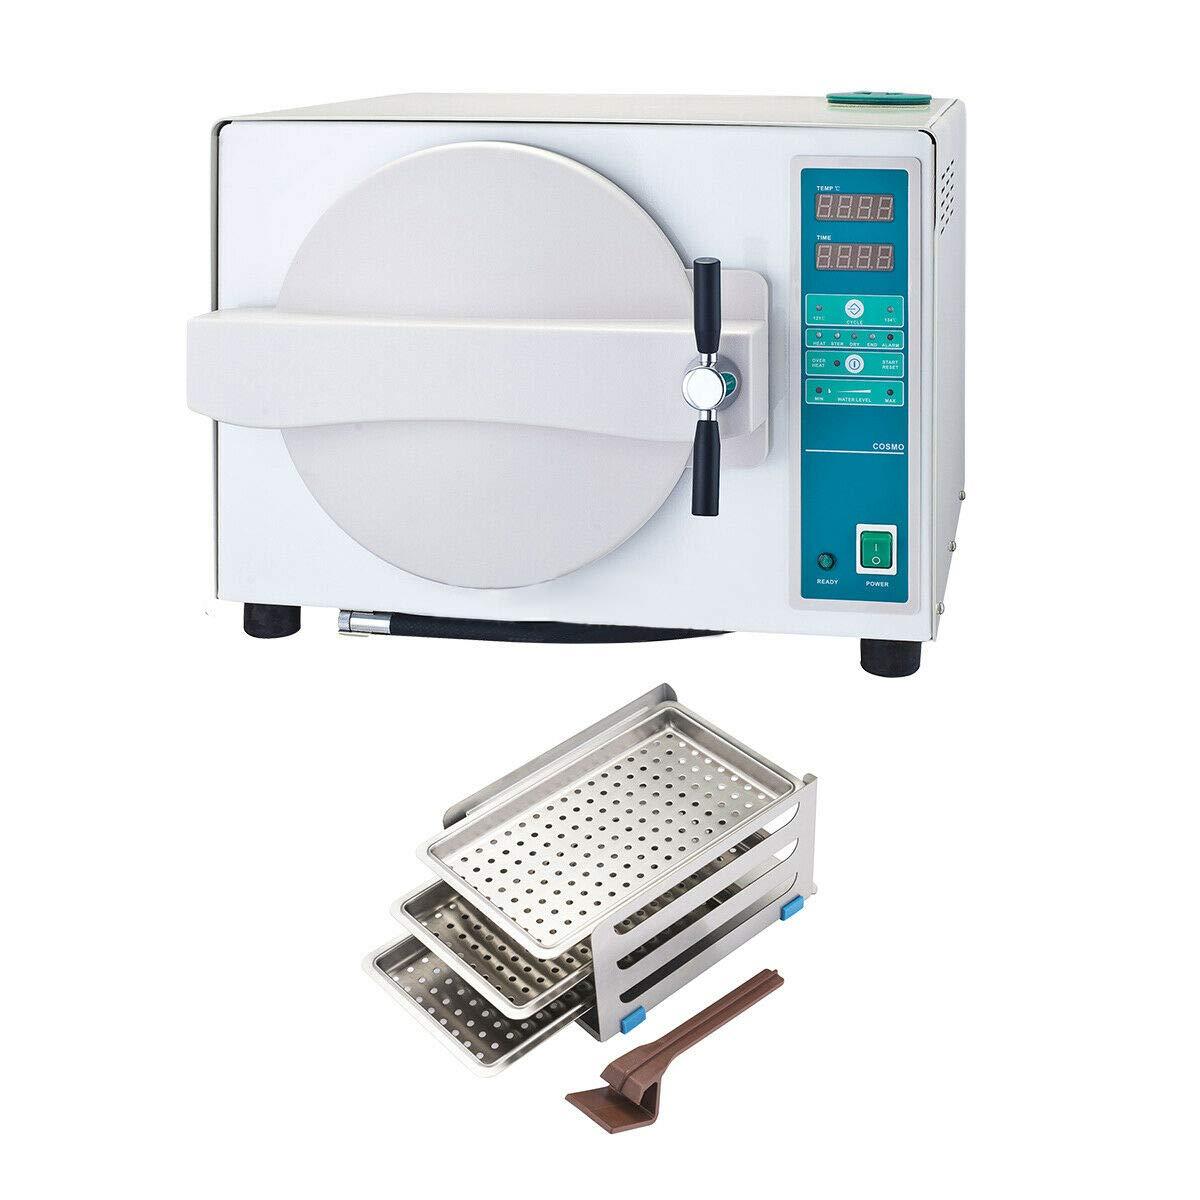 APHRODITE Micro Surgical Complete Free Shipping Be super welcome Vacuum Steam Sterilizer 18L Autoclave C